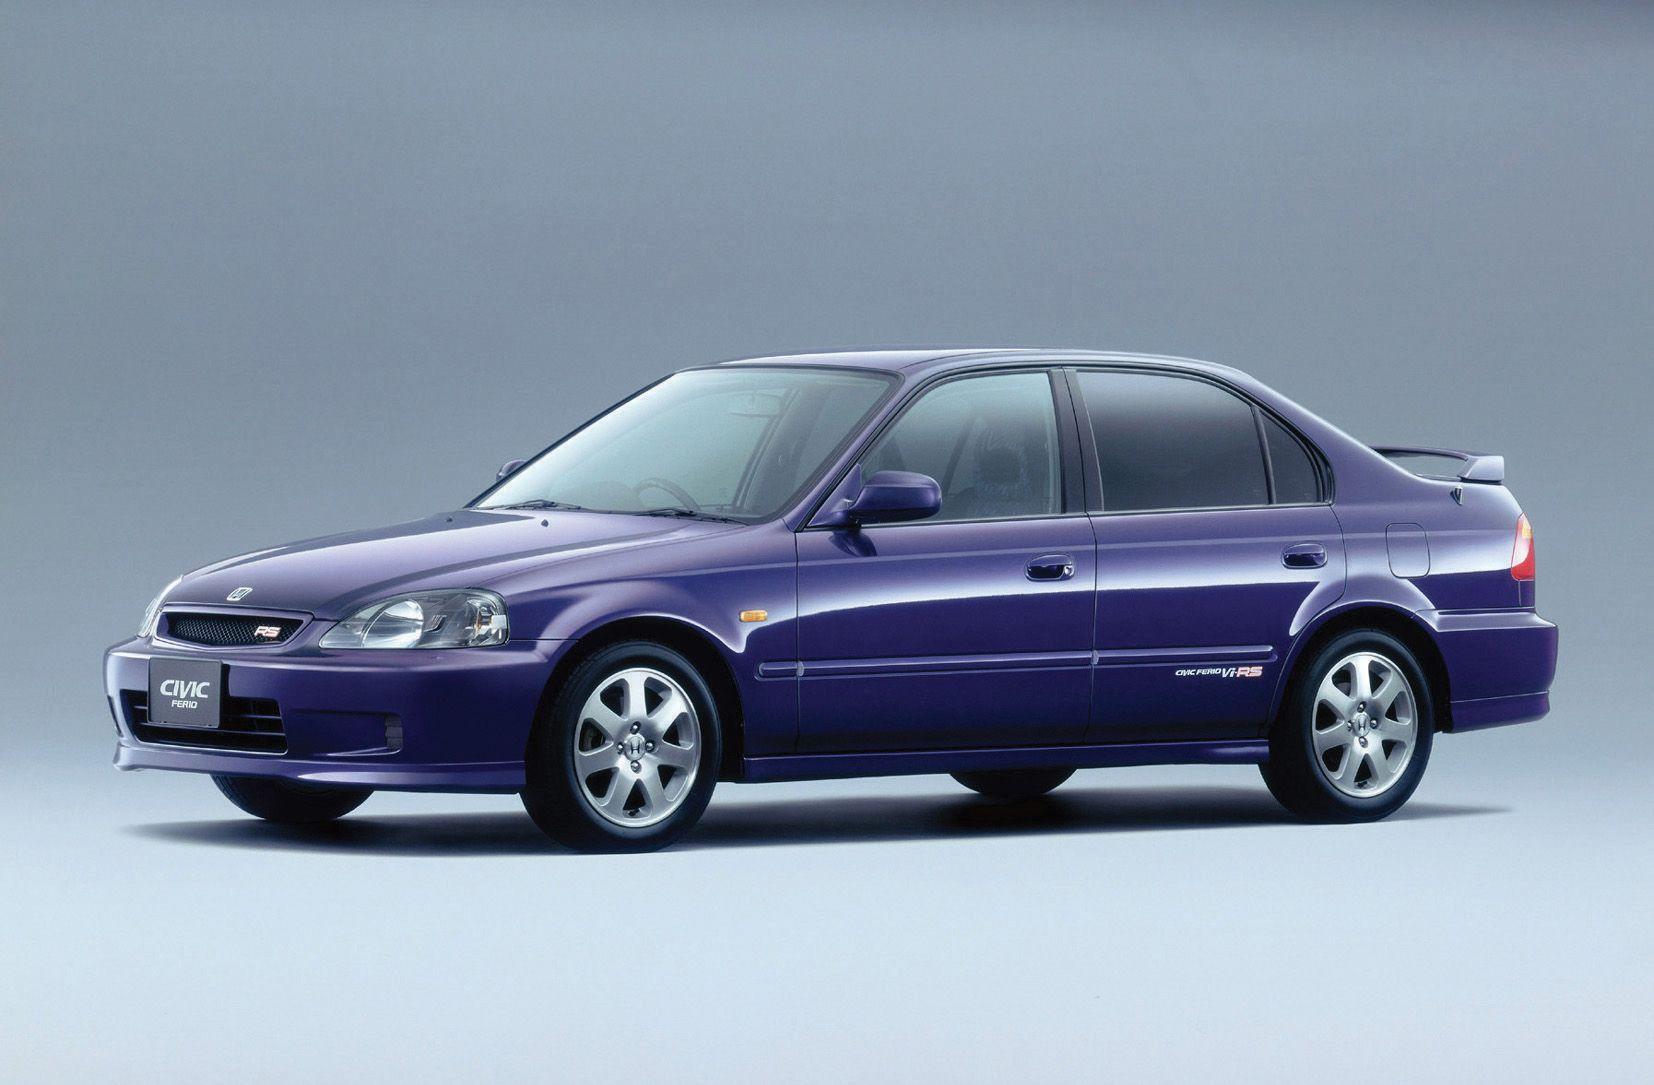 19982000 Honda Civic Ferio ViRS